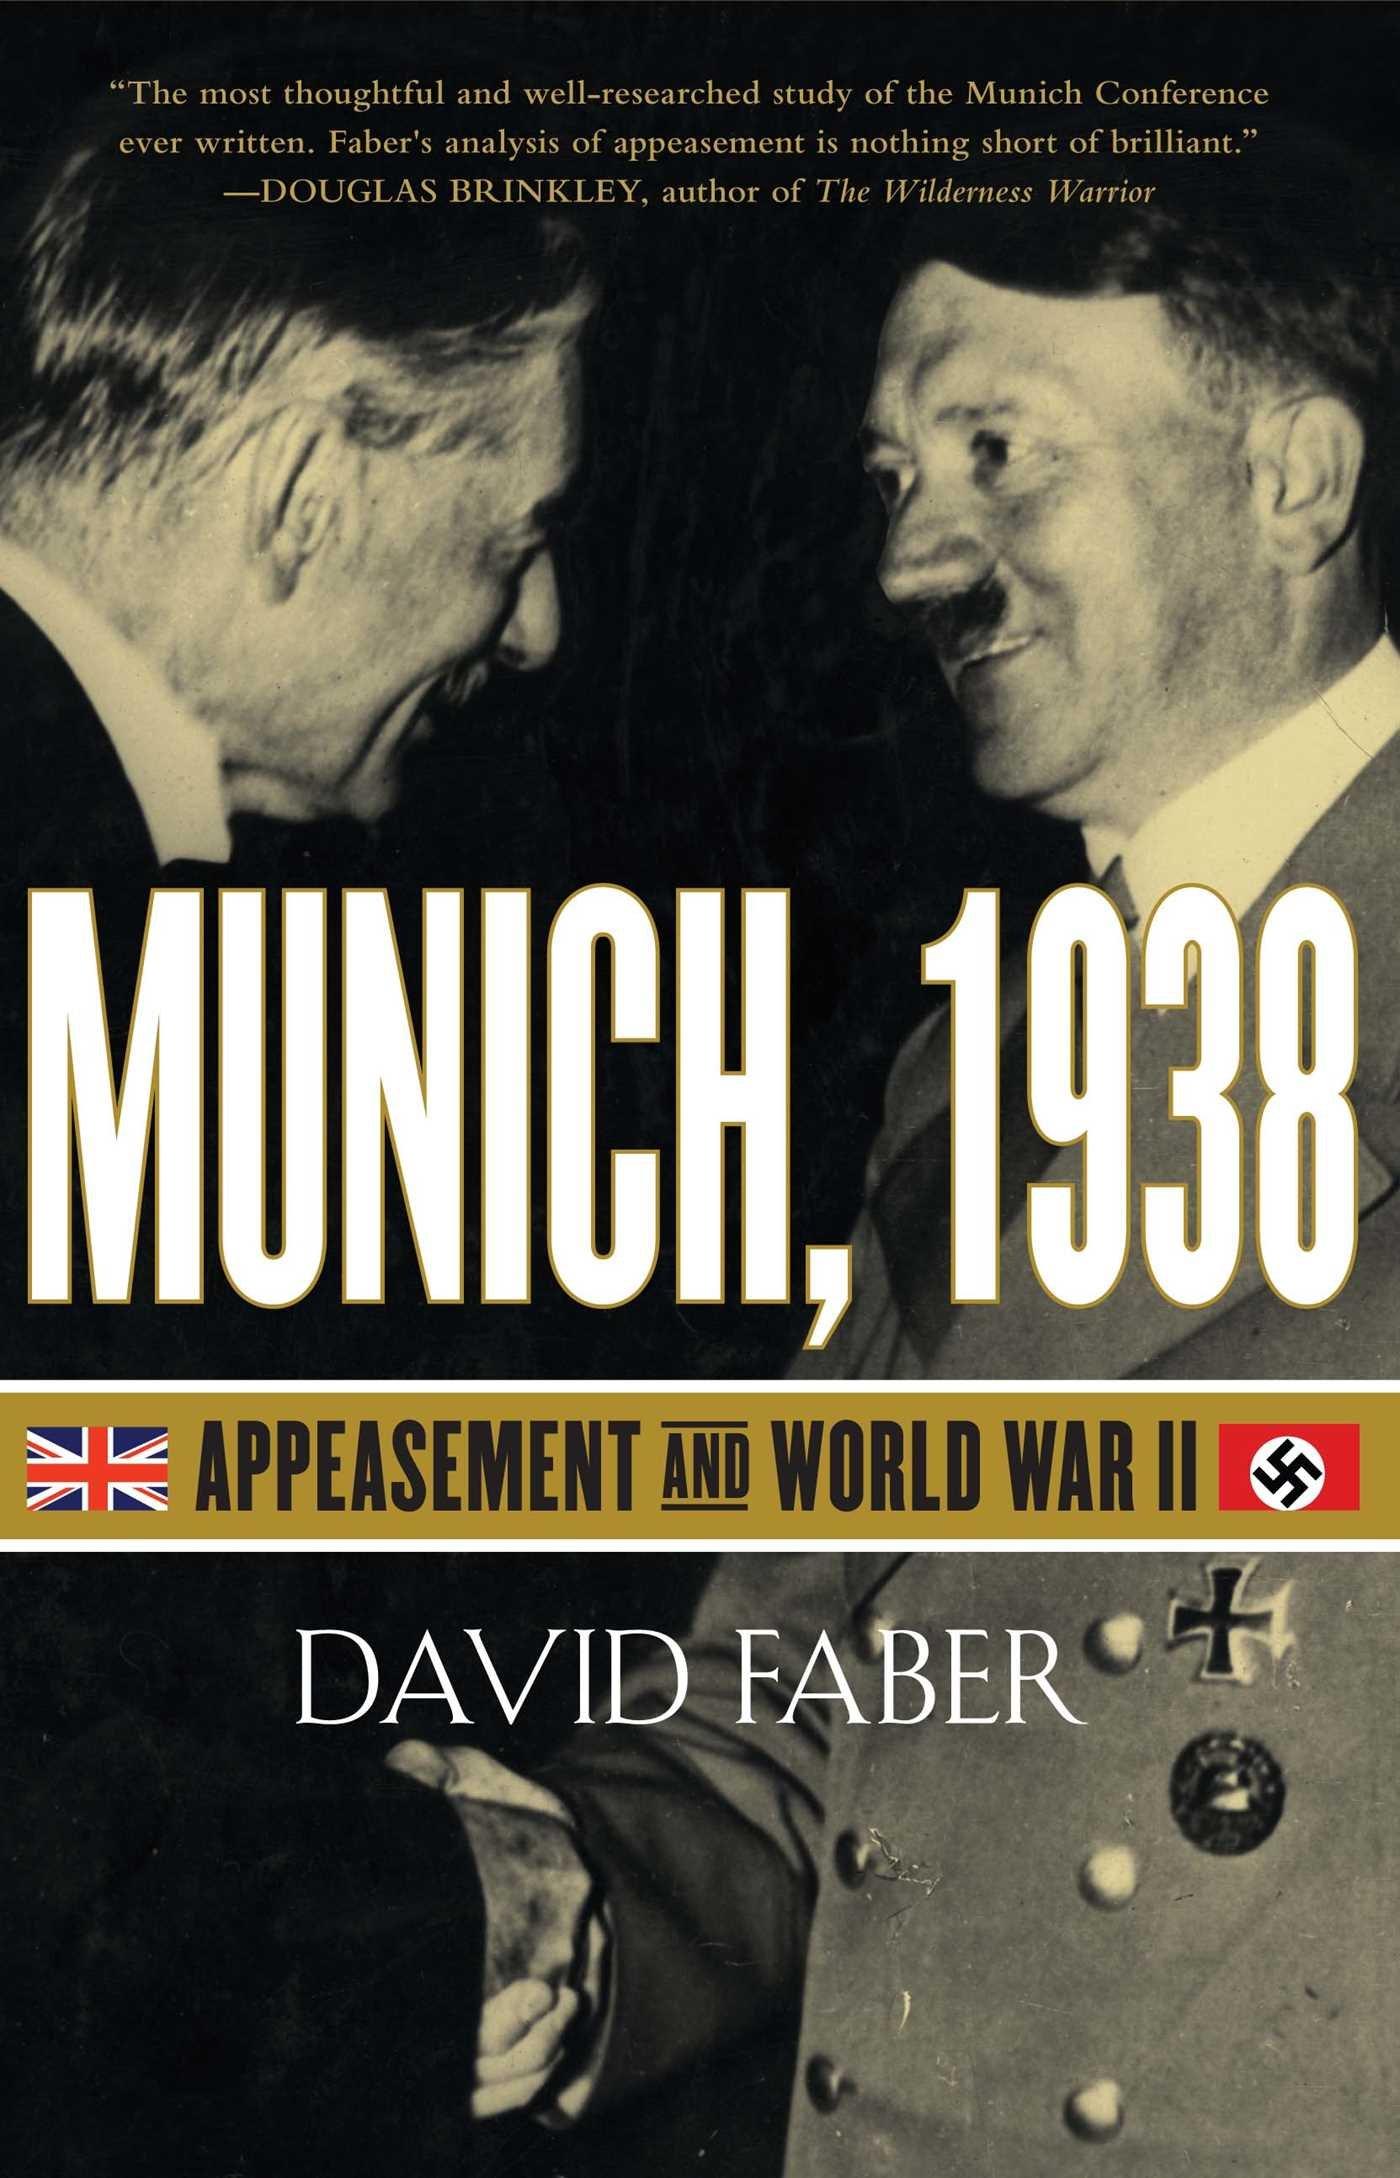 Munich, 1938: Appeasement and World War II PDF